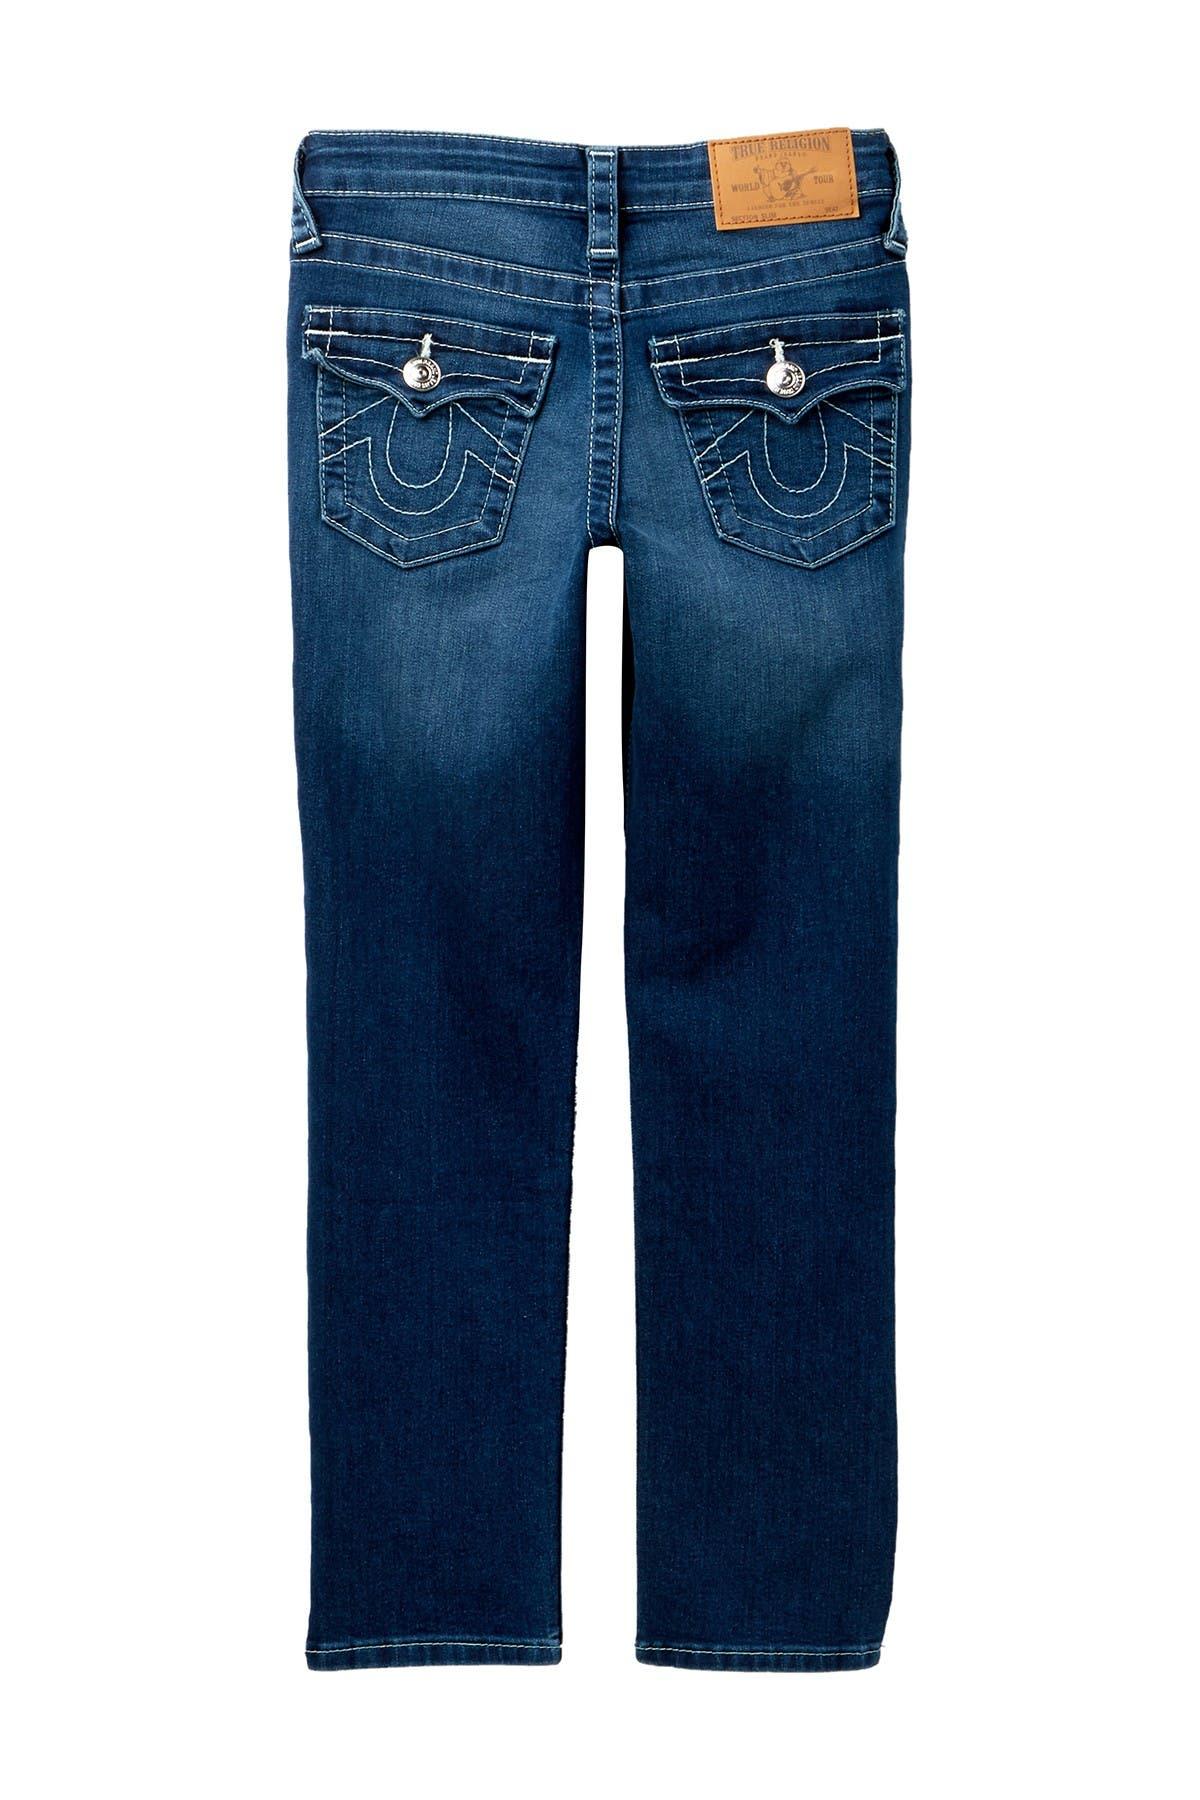 Image of True Religion Slim Single End Jeans